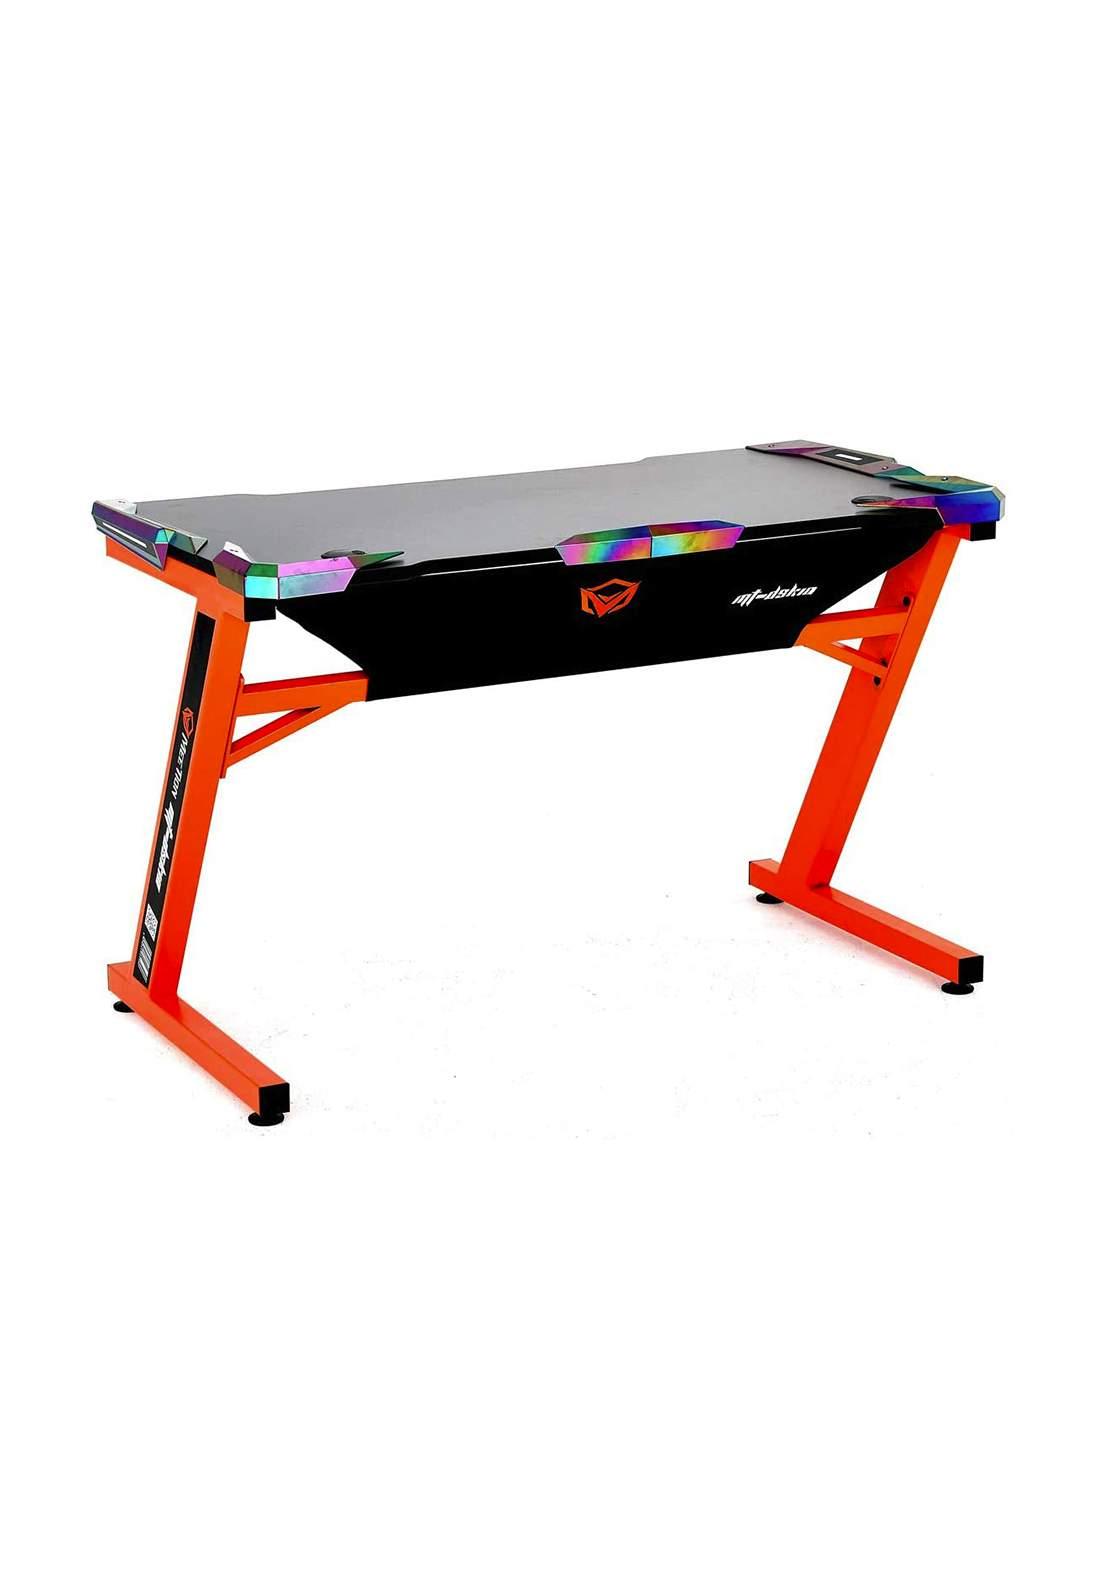 Meetion DSK10 Z Shaped PC Gaming Computer E-Sport Desk - Black and Orange طاولة حاسبة